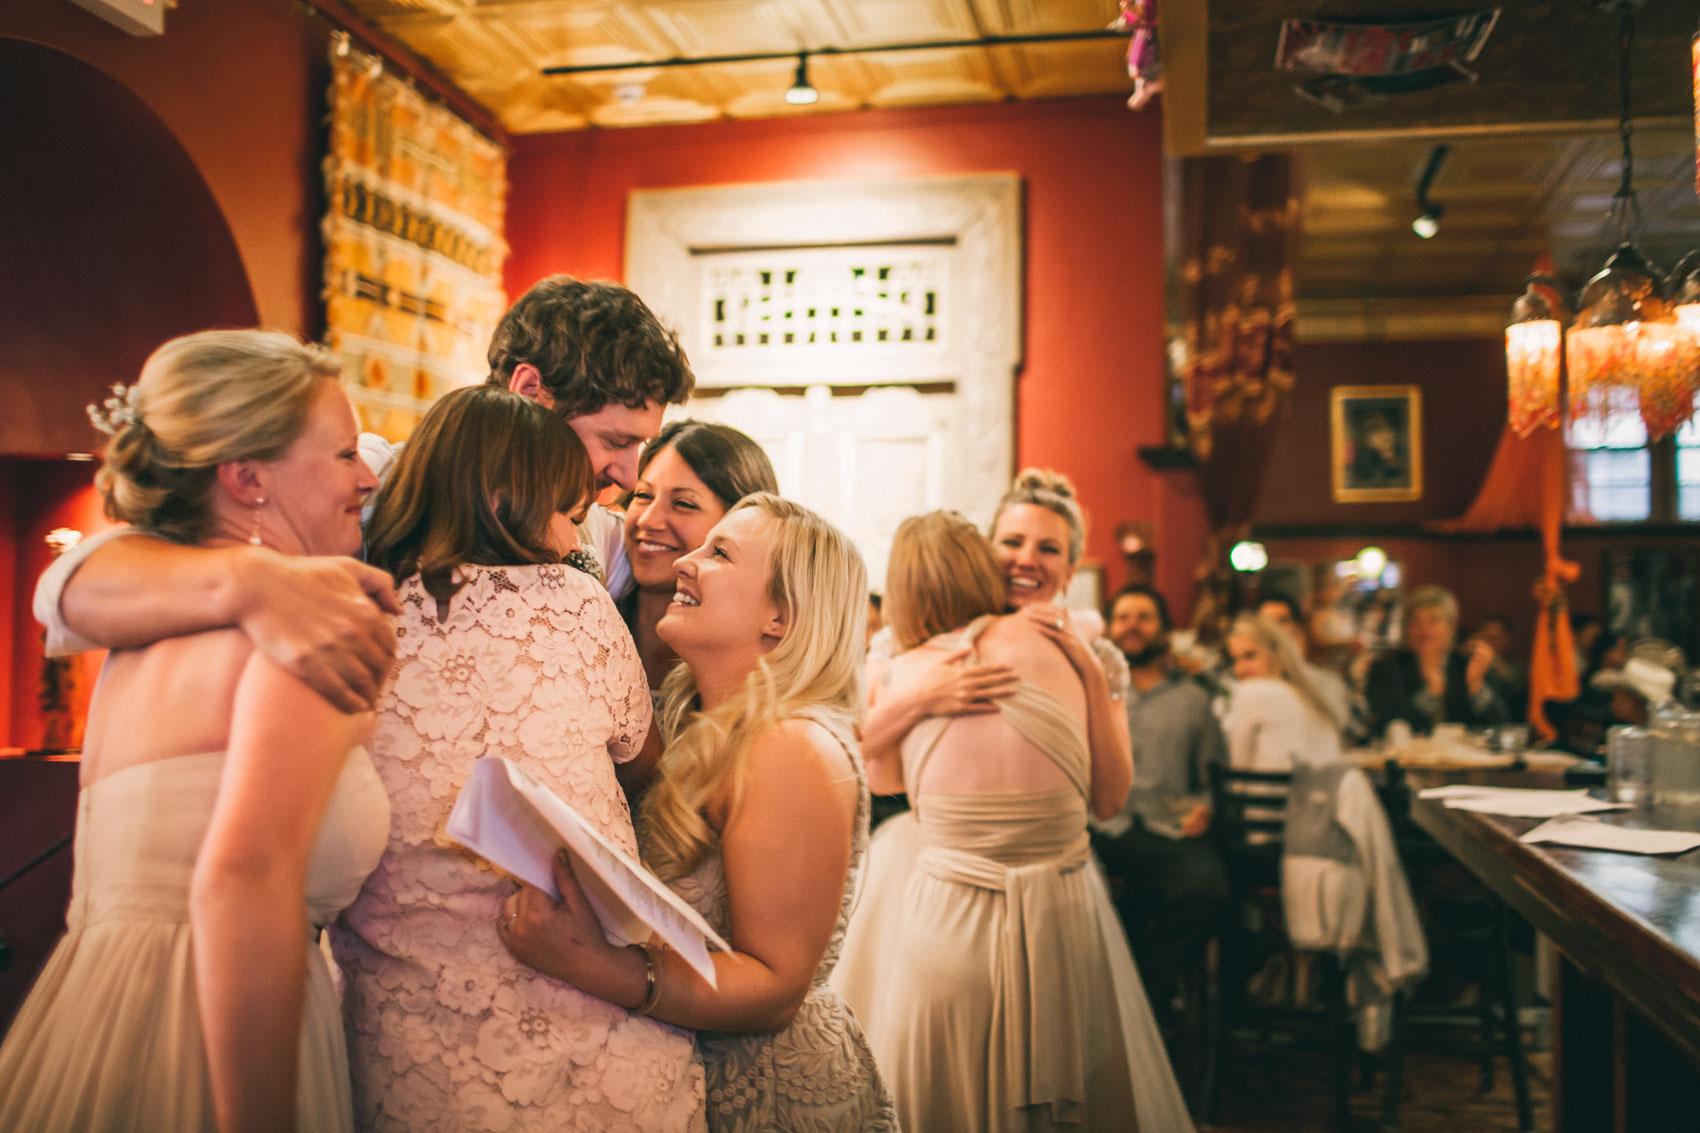 050_Crested Butte Wedding Photographer Secret Stash Woods Walk Ceremony Jamie Blue Bird Events Boho Epic Stars